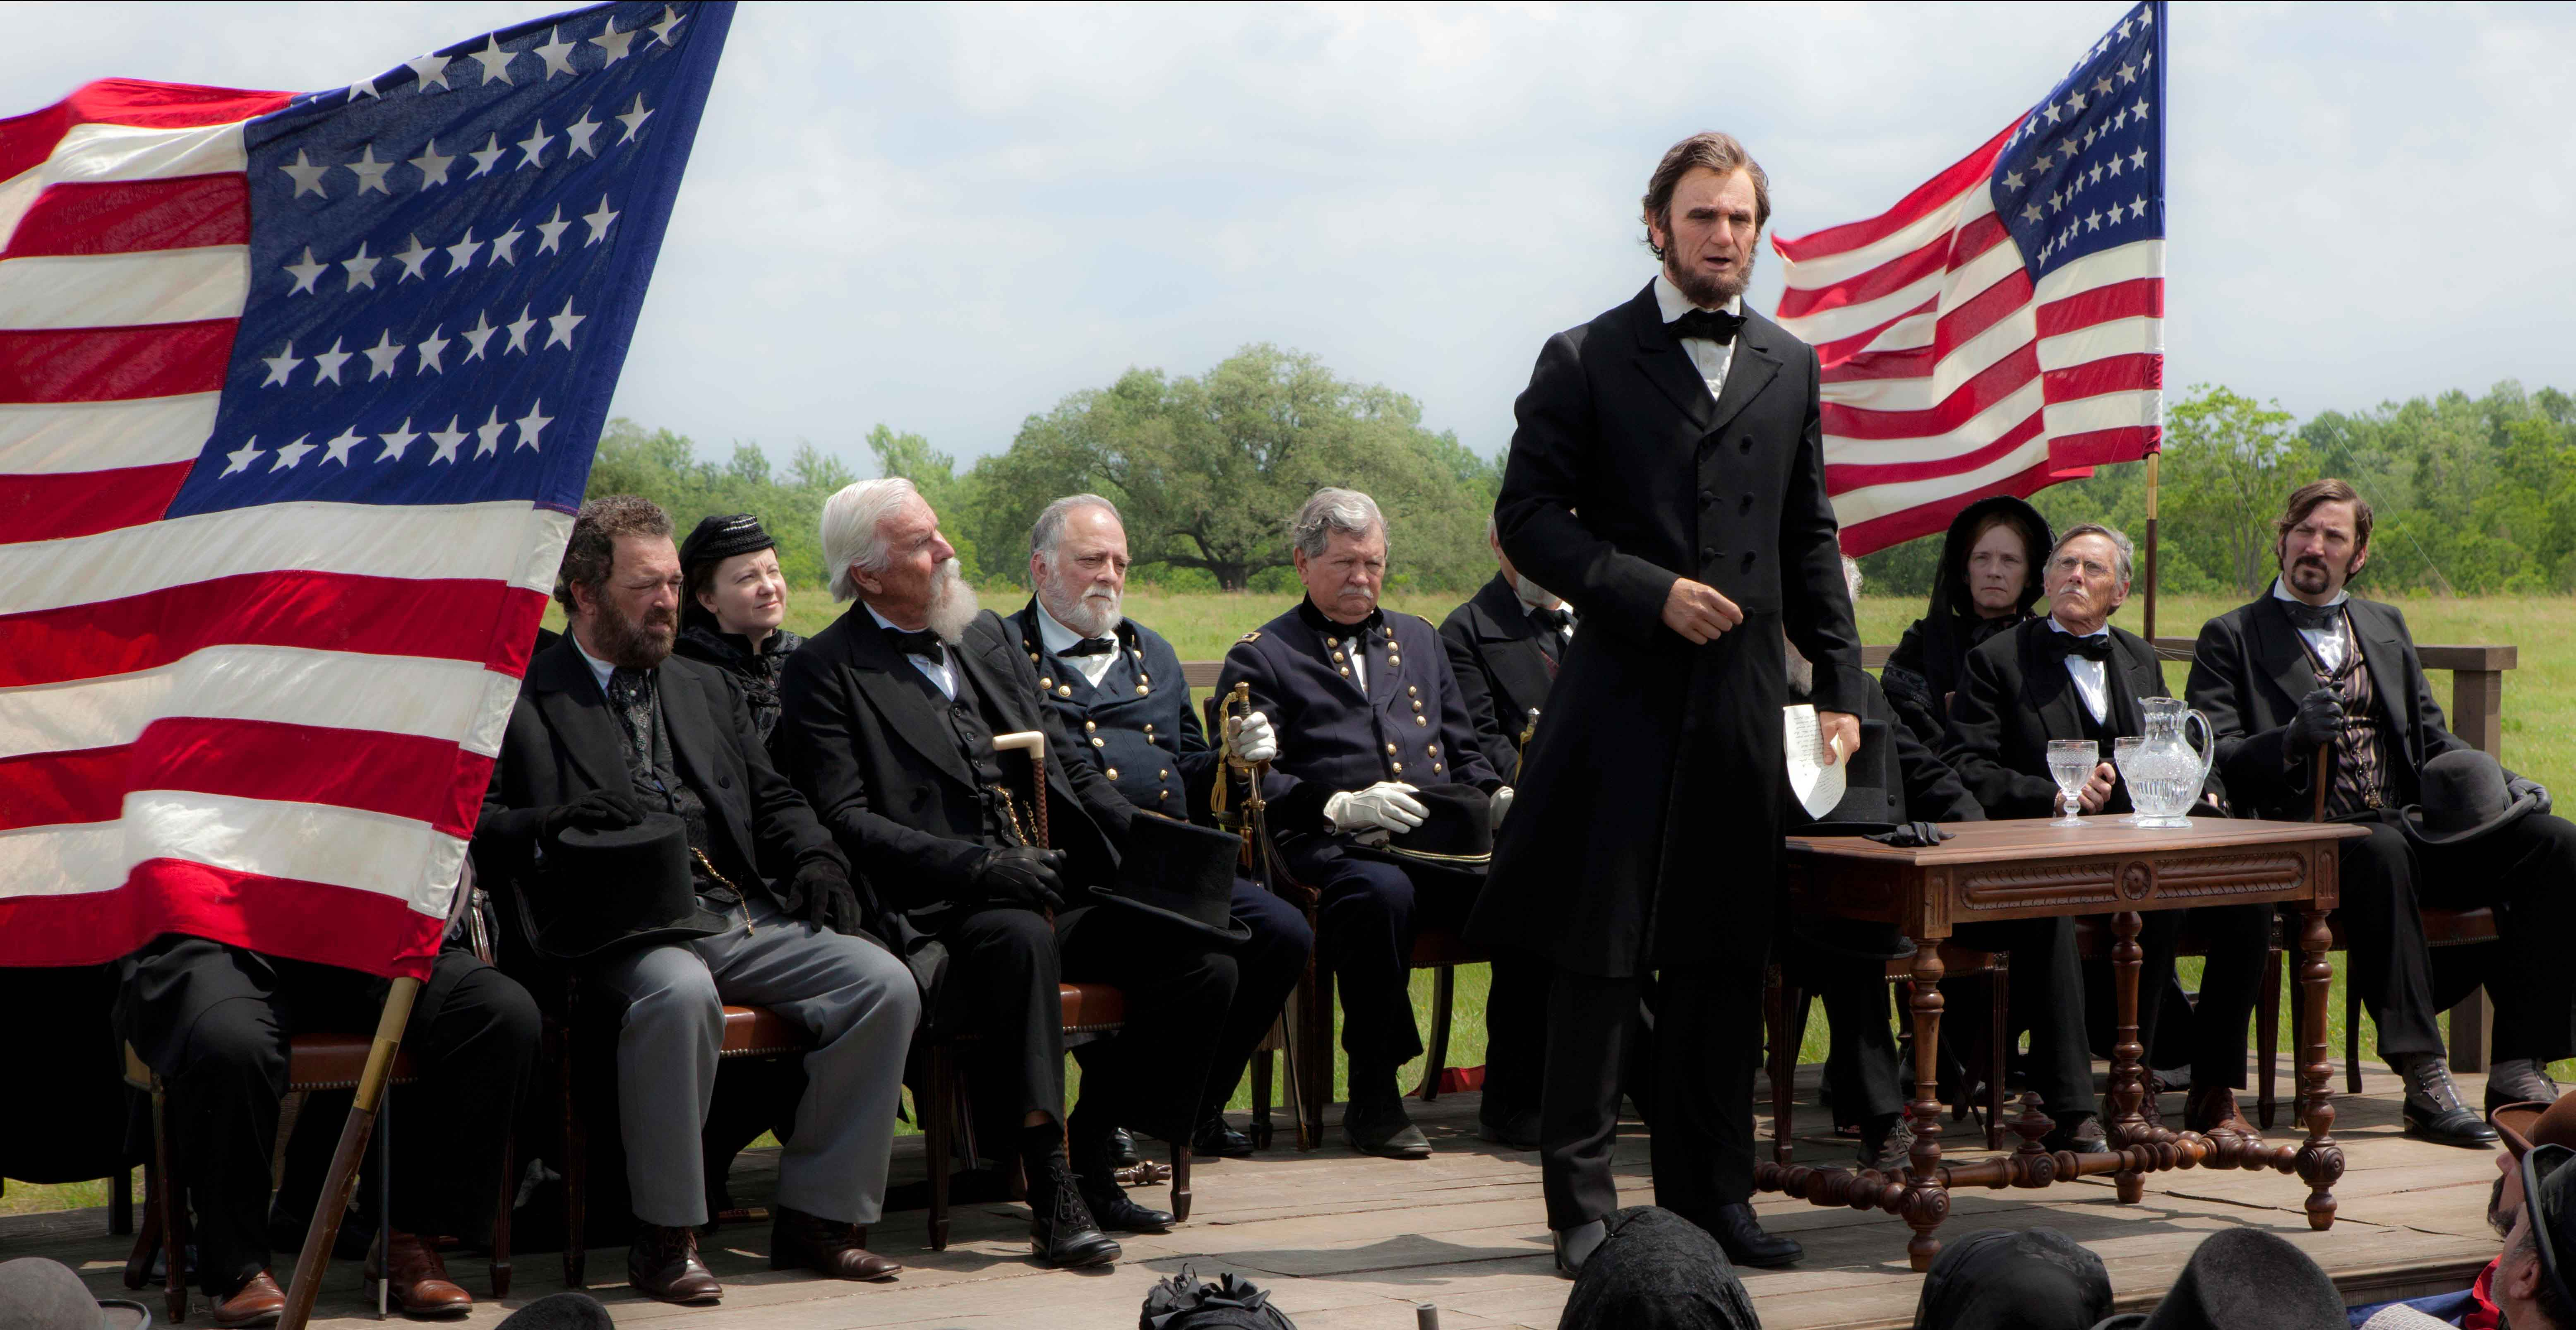 New Abraham Lincoln: Vampire Hunter Photos